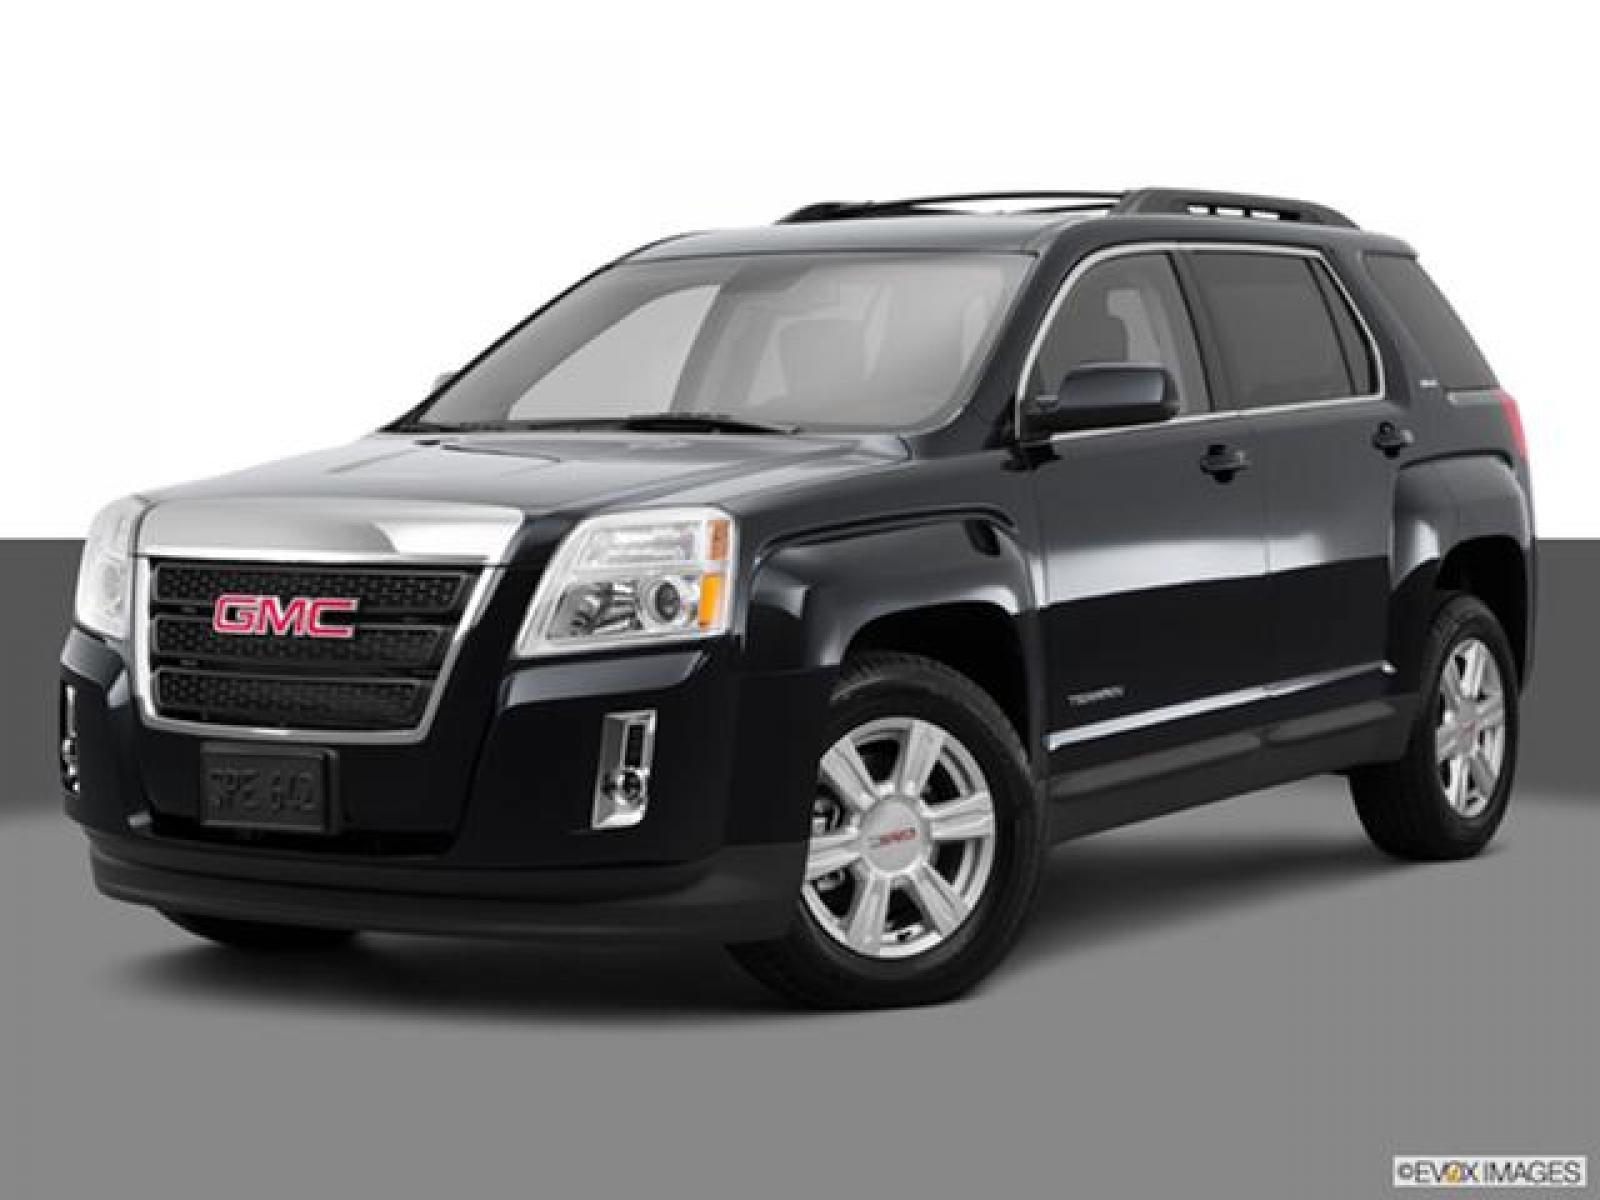 long tucson test autos hyundai chevrolet jy ca update car term drives